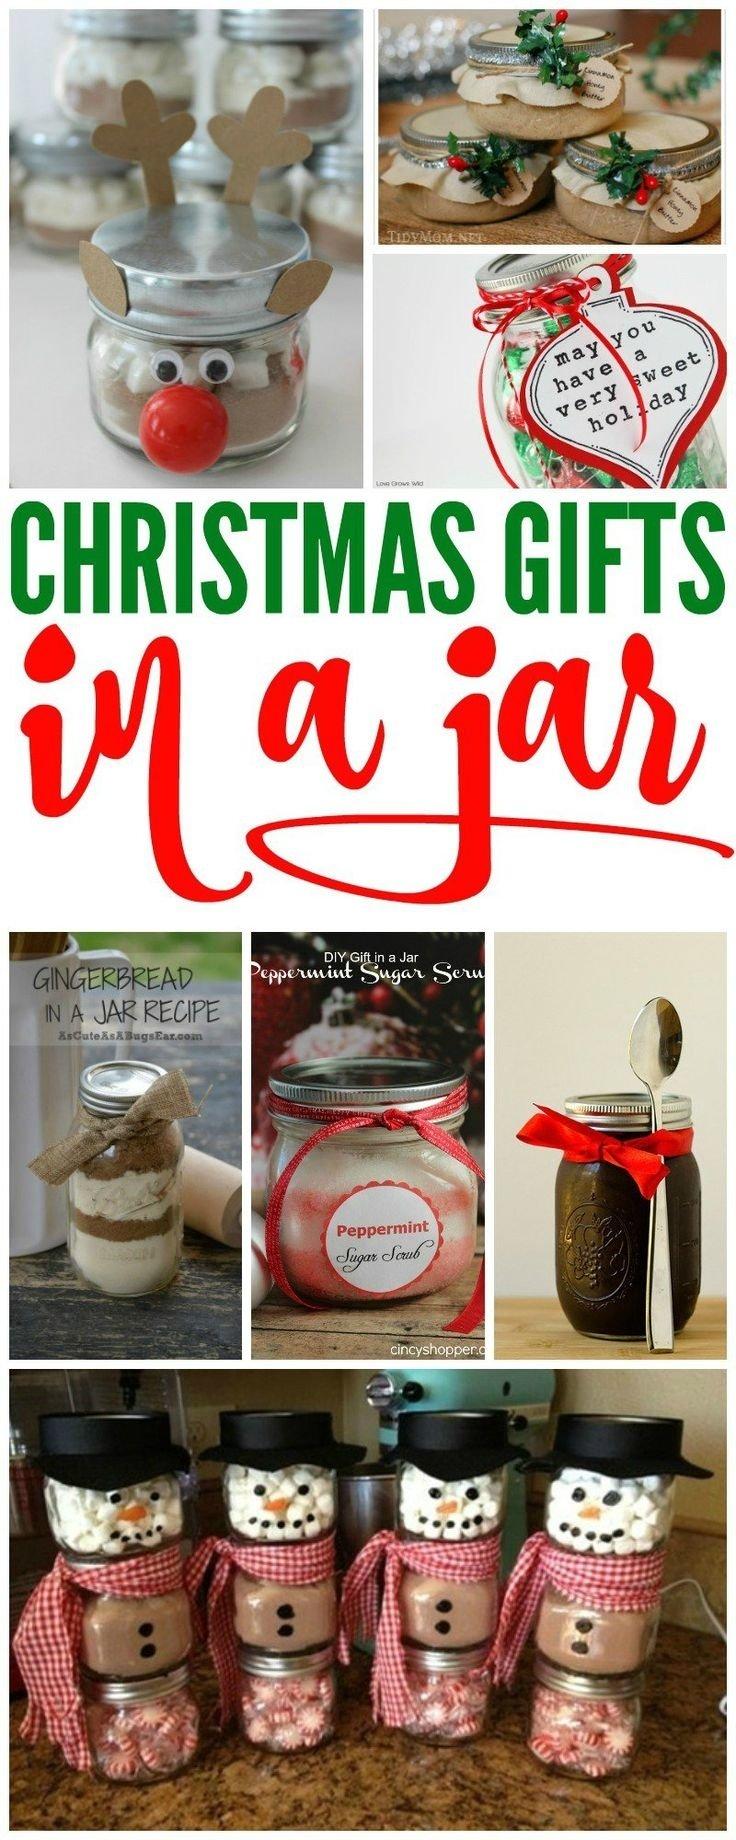 10 Lovable Small Gift Ideas For Girlfriend 72 best christmas gift ideas for teachers images on pinterest 2020